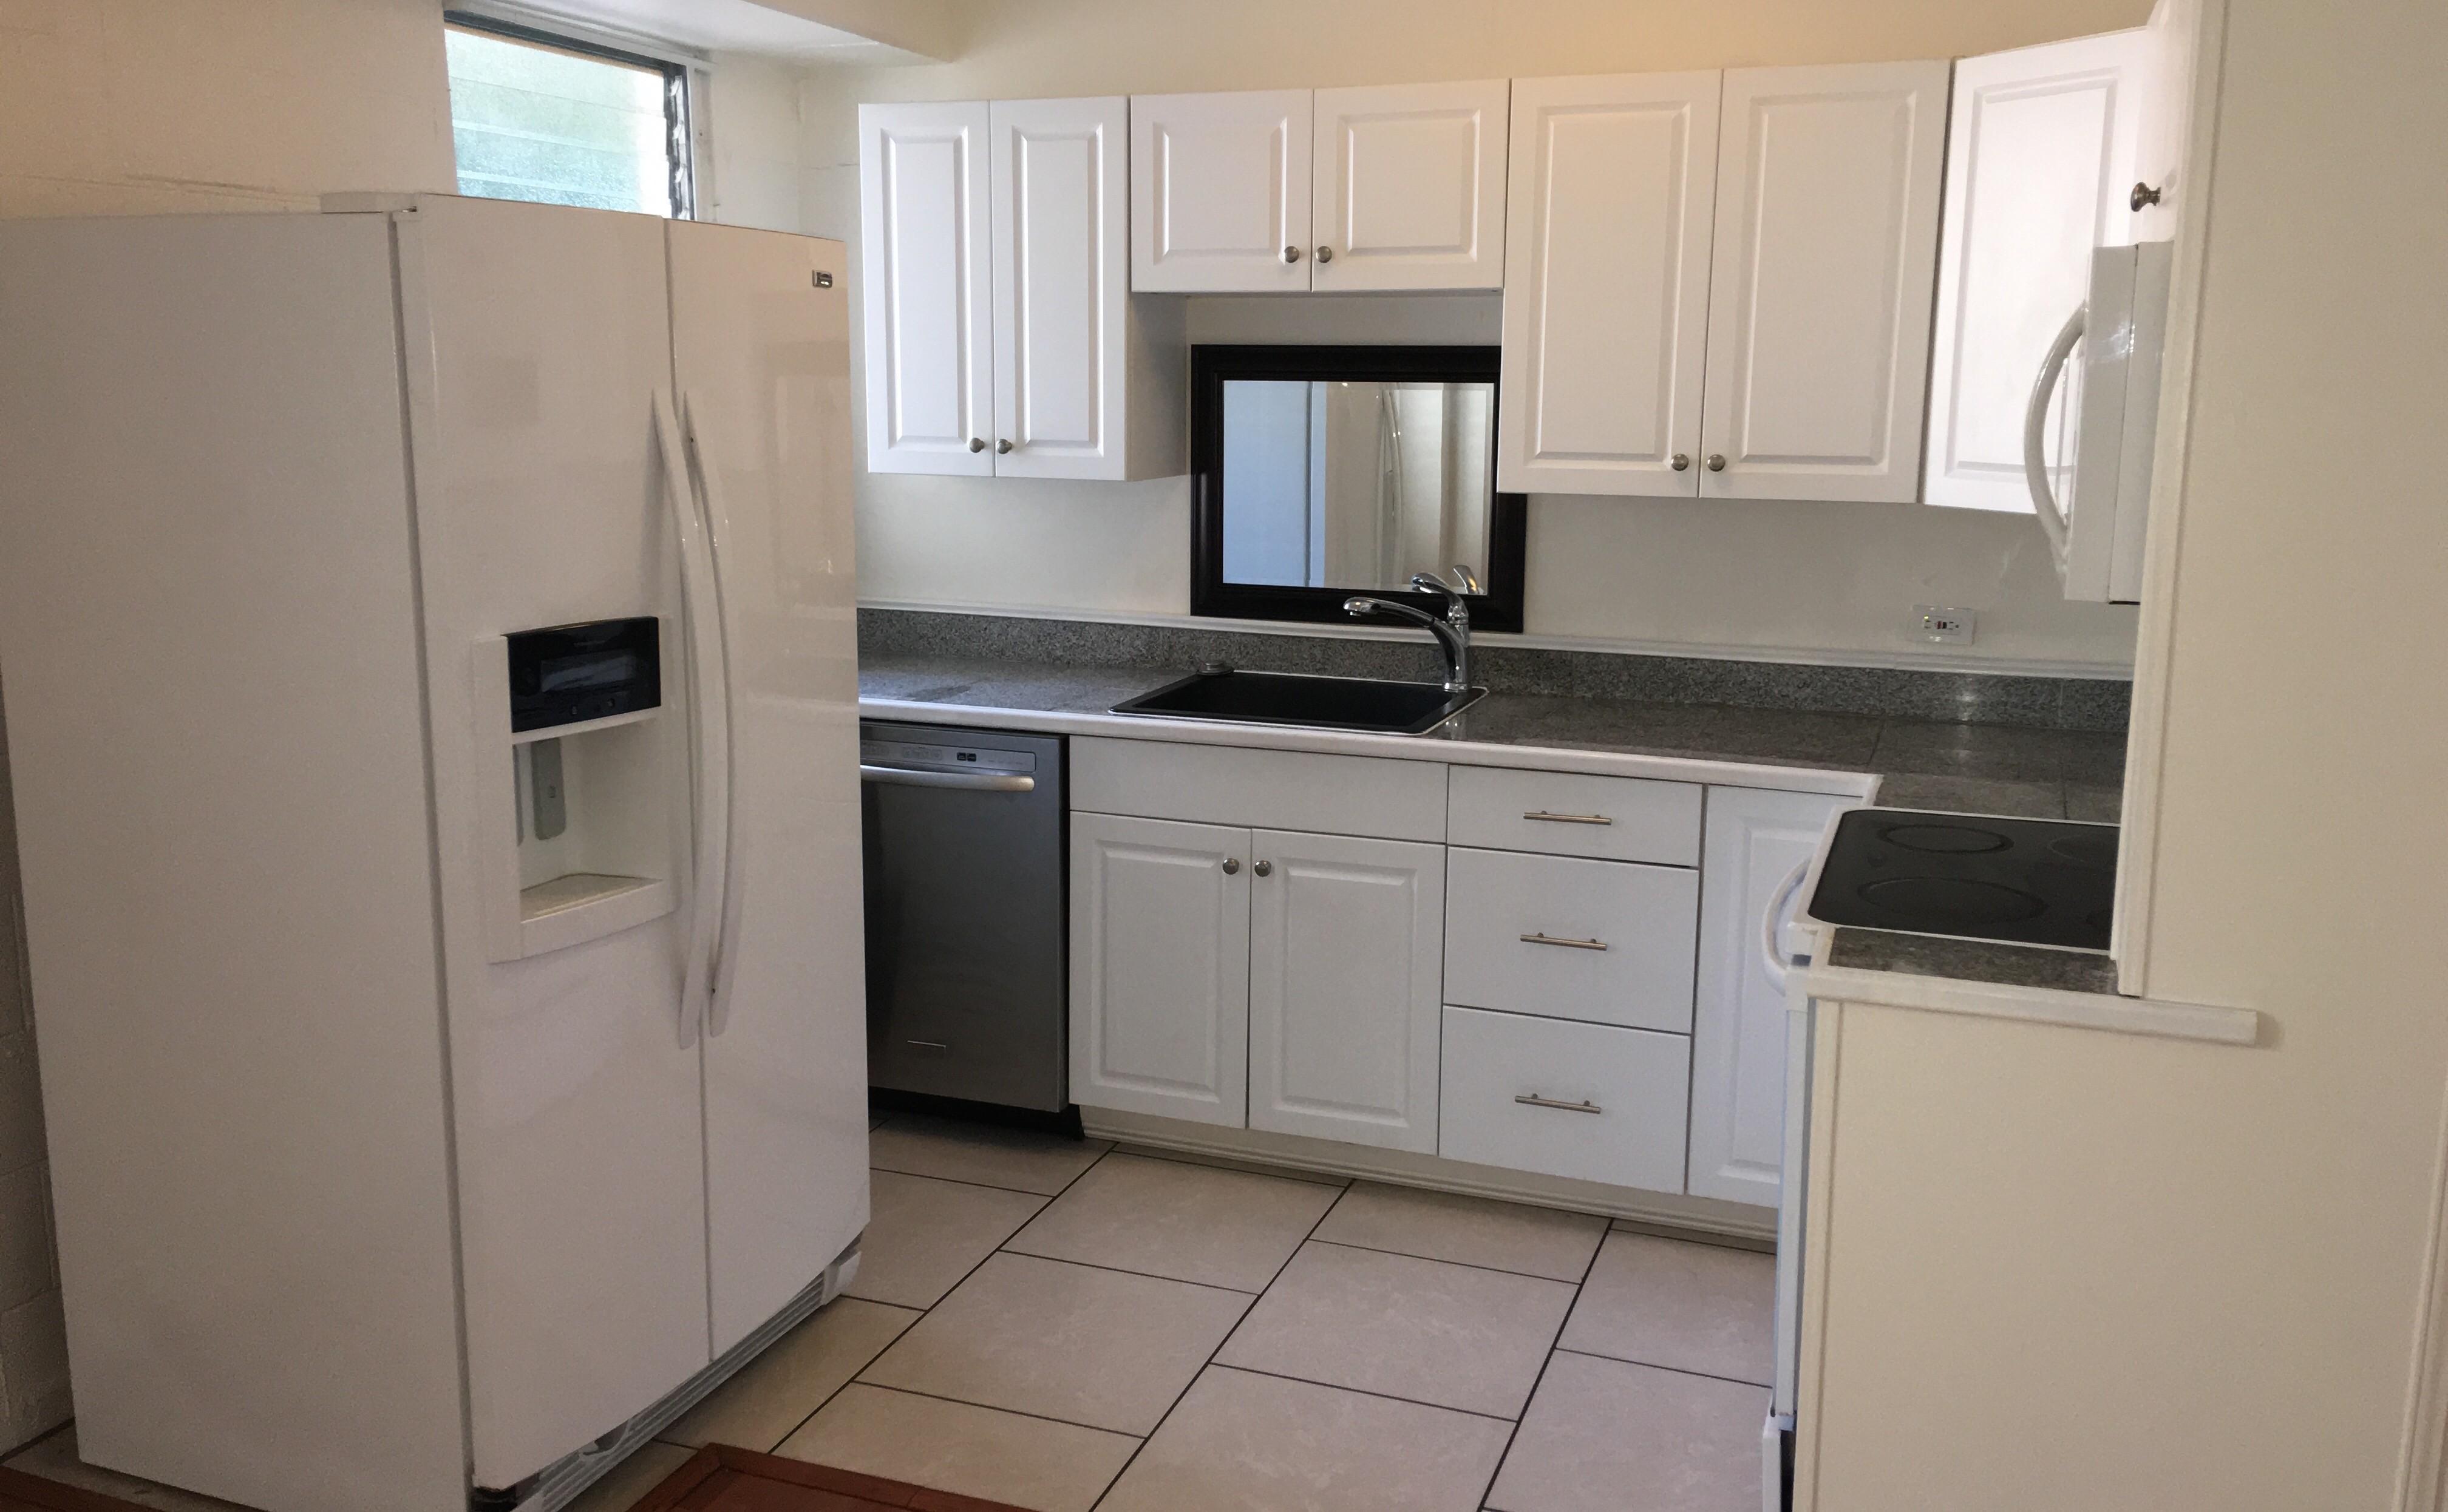 1737 S Beretania St 201b Honolulu Hi 96826 1 Bedroom Condo For Rent For 1 495 Month Zumper